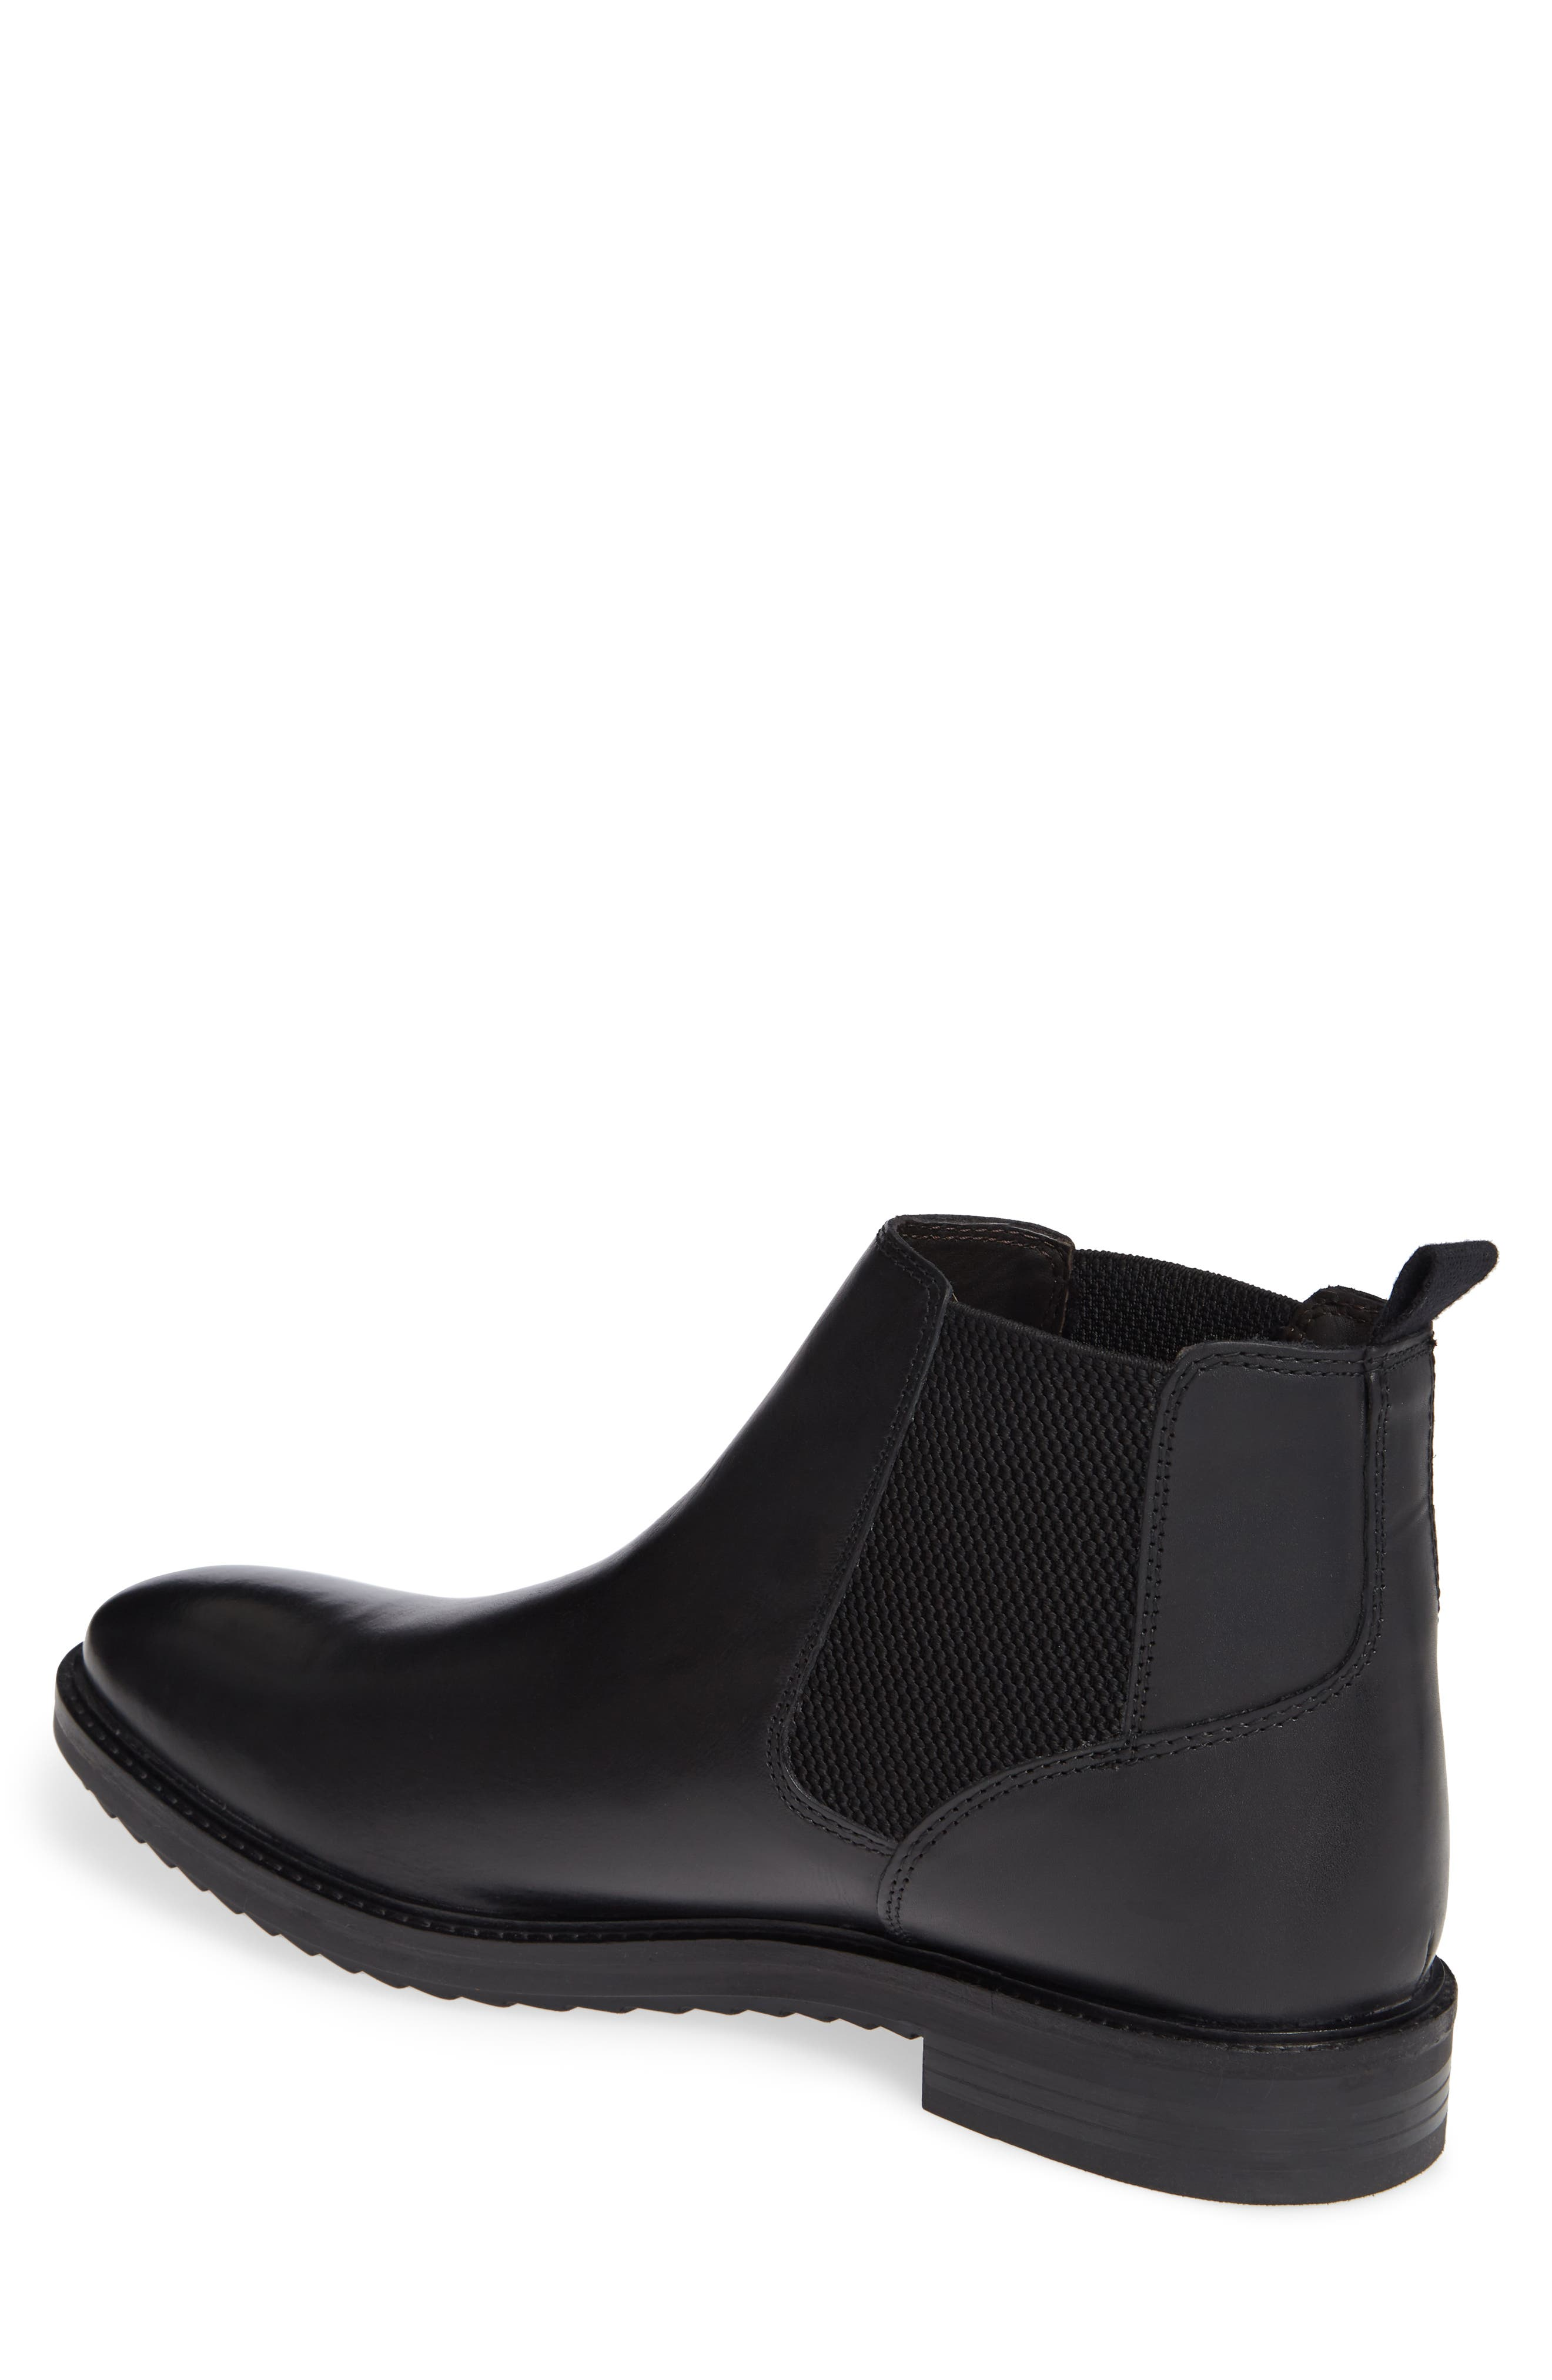 Kingsley Chelsea Boot,                             Alternate thumbnail 2, color,                             BLACK